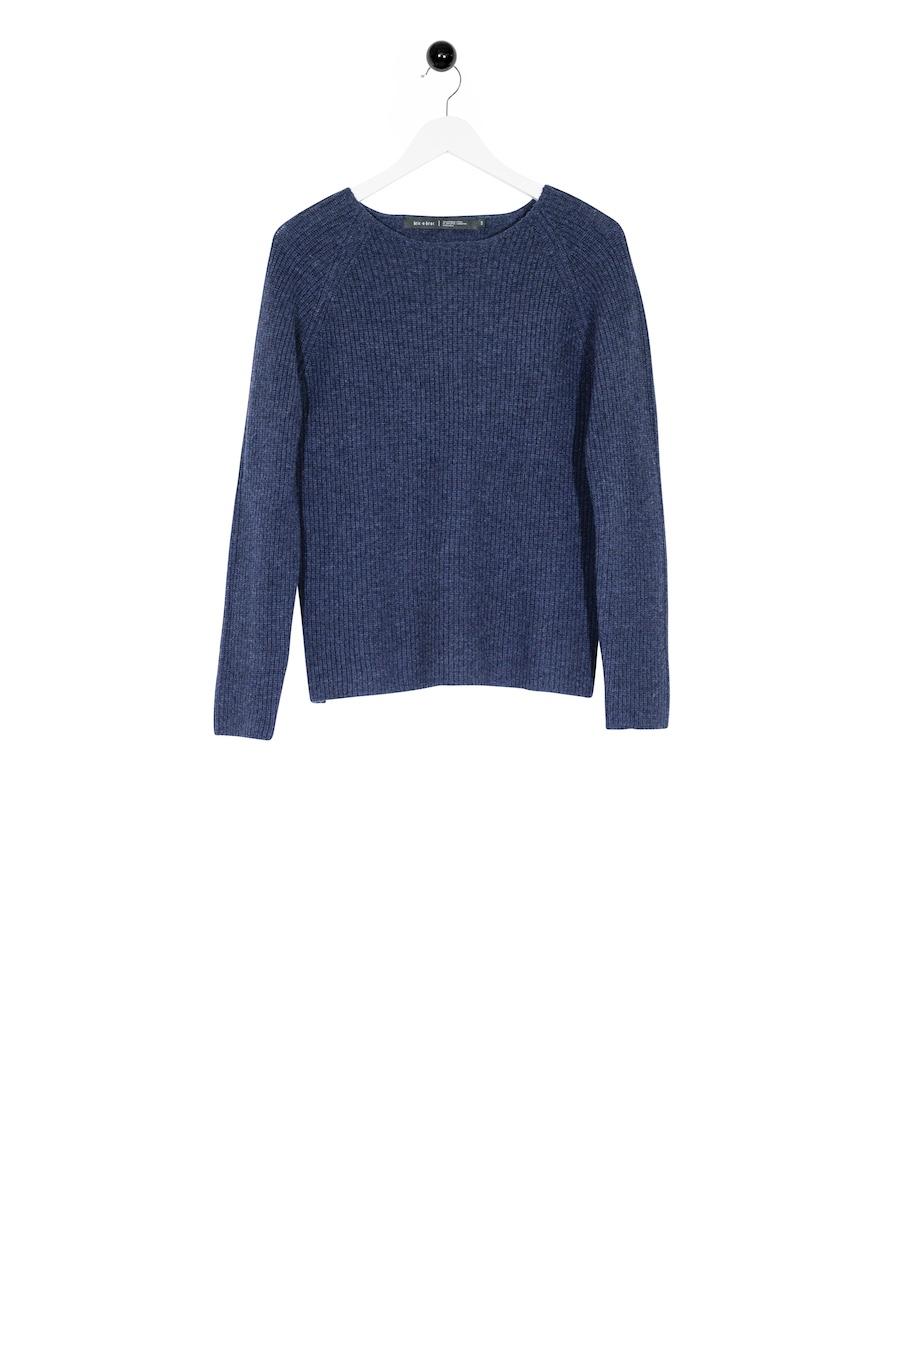 Hurva Sweater